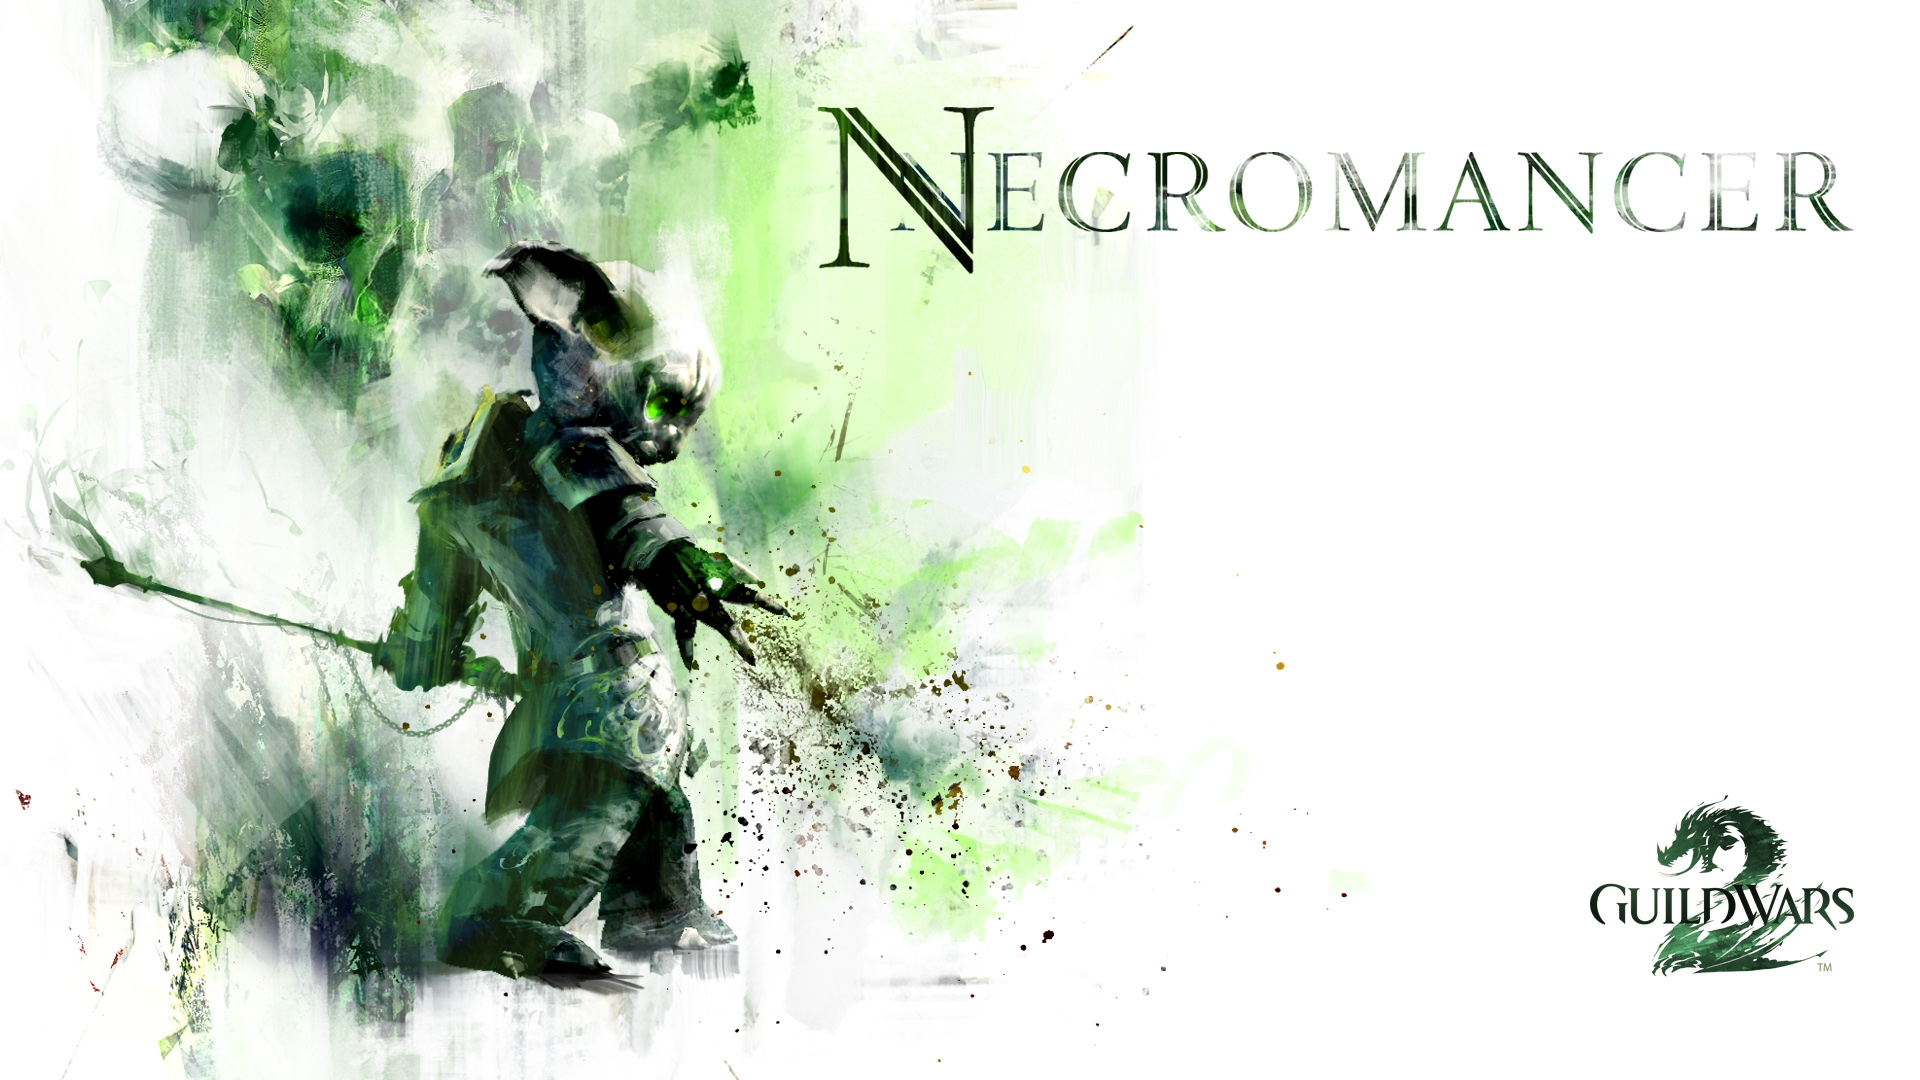 Guild Wars 2 Necromancer Graphics Wallpaper Hd Games 4k